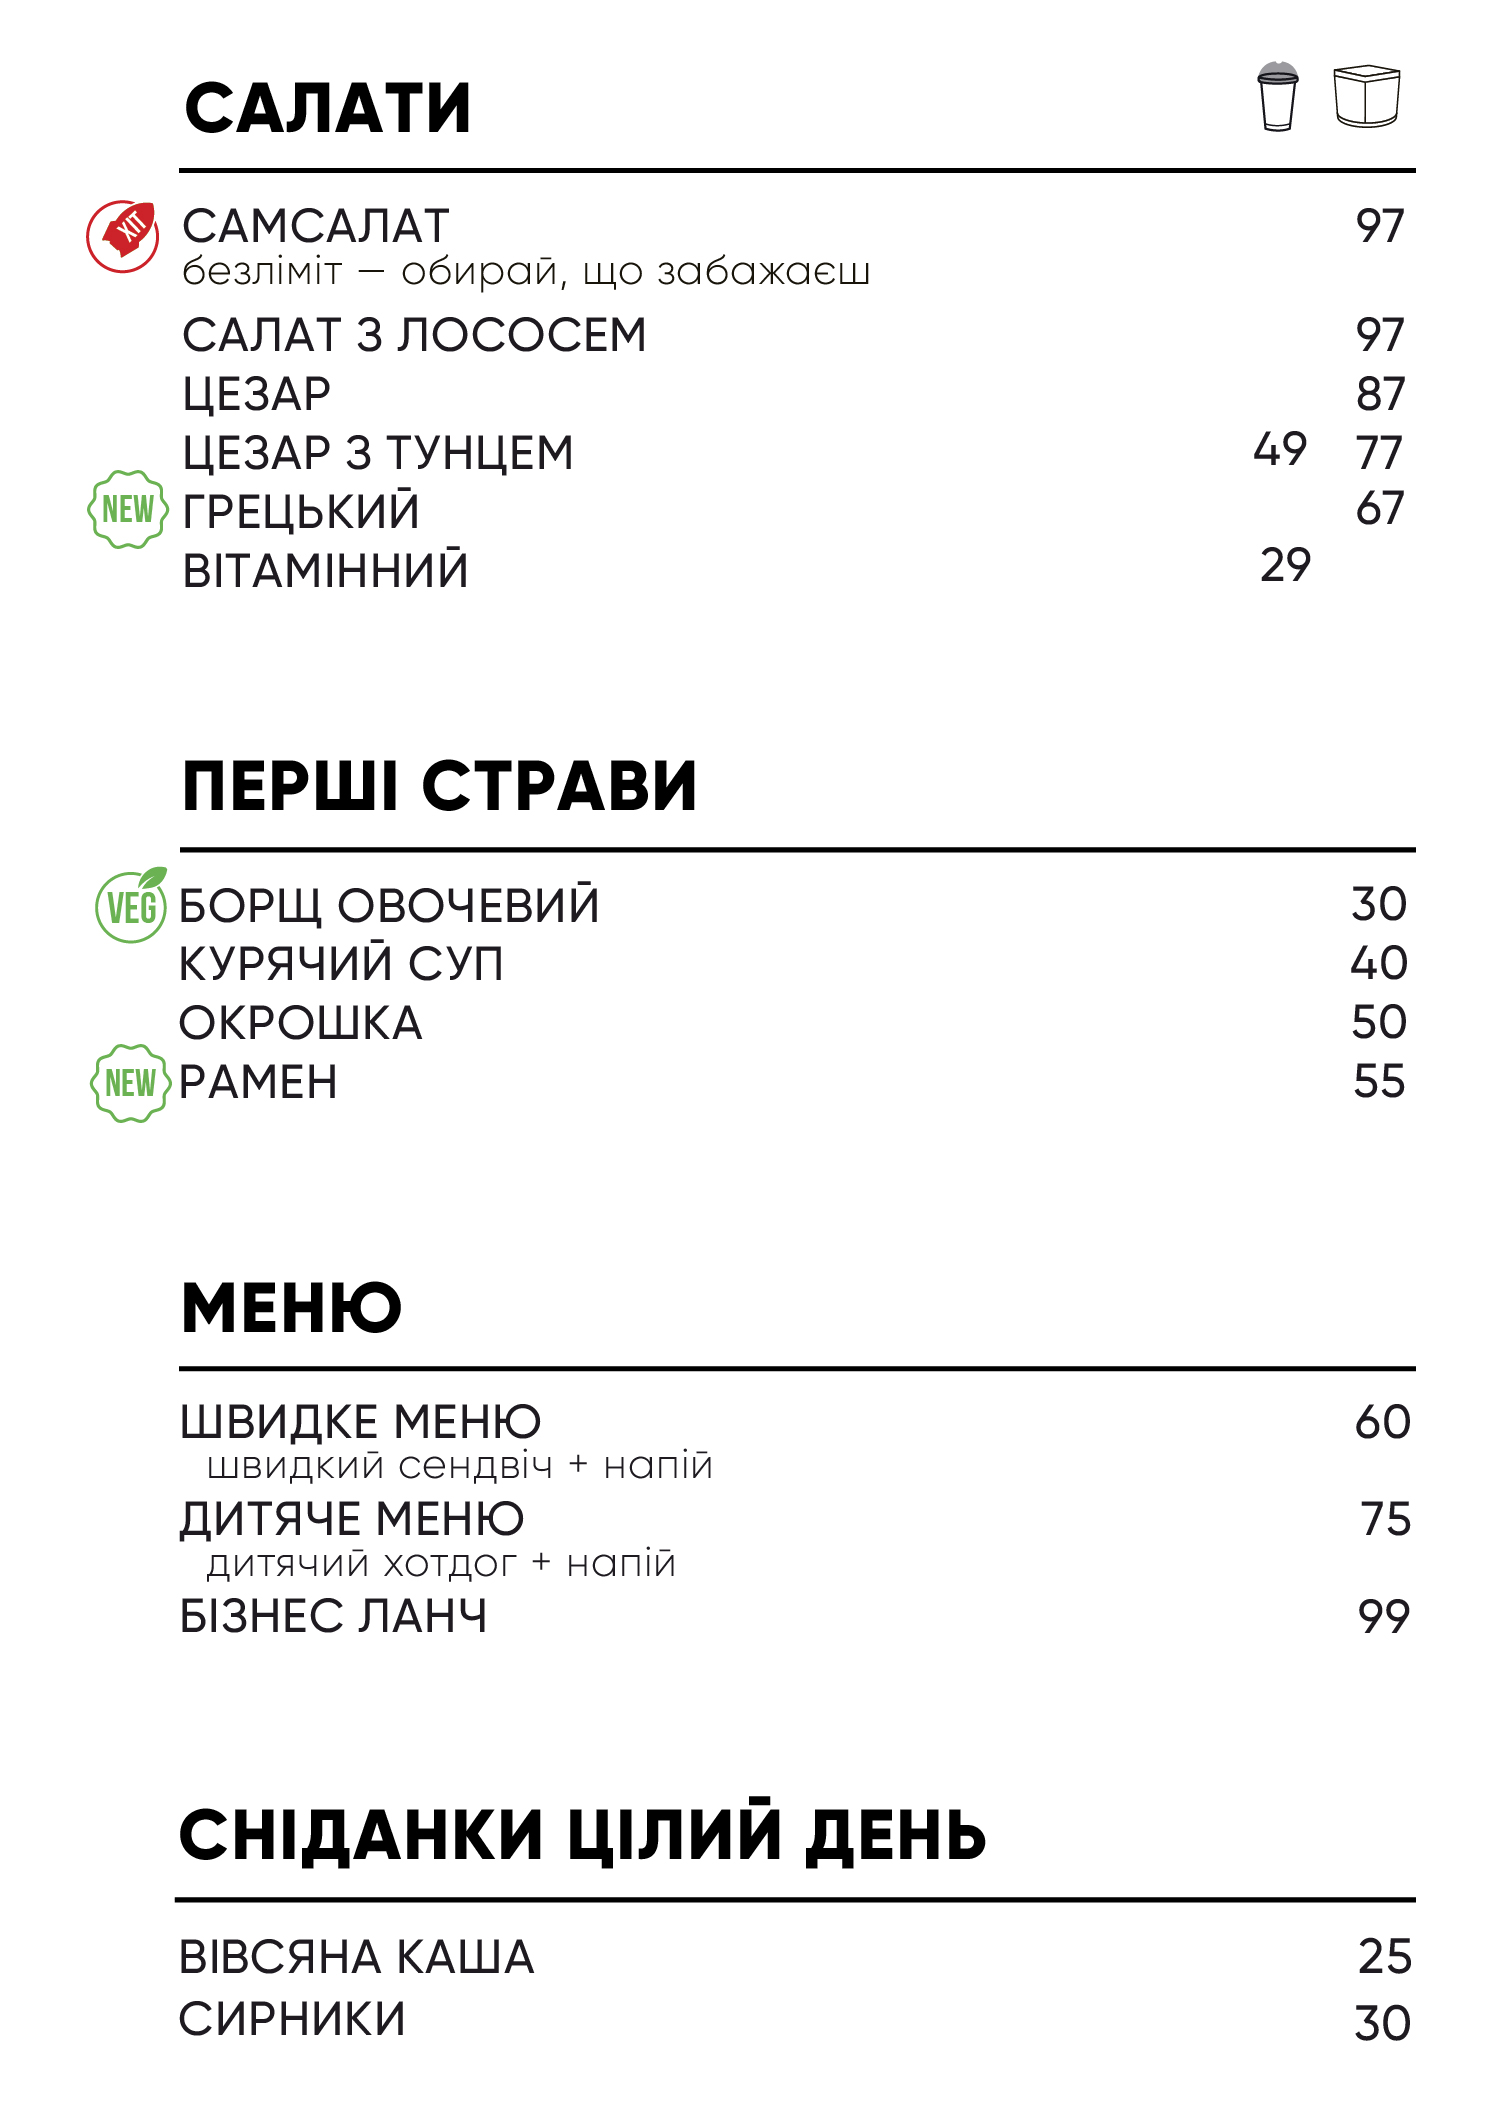 киев_60Х85-03